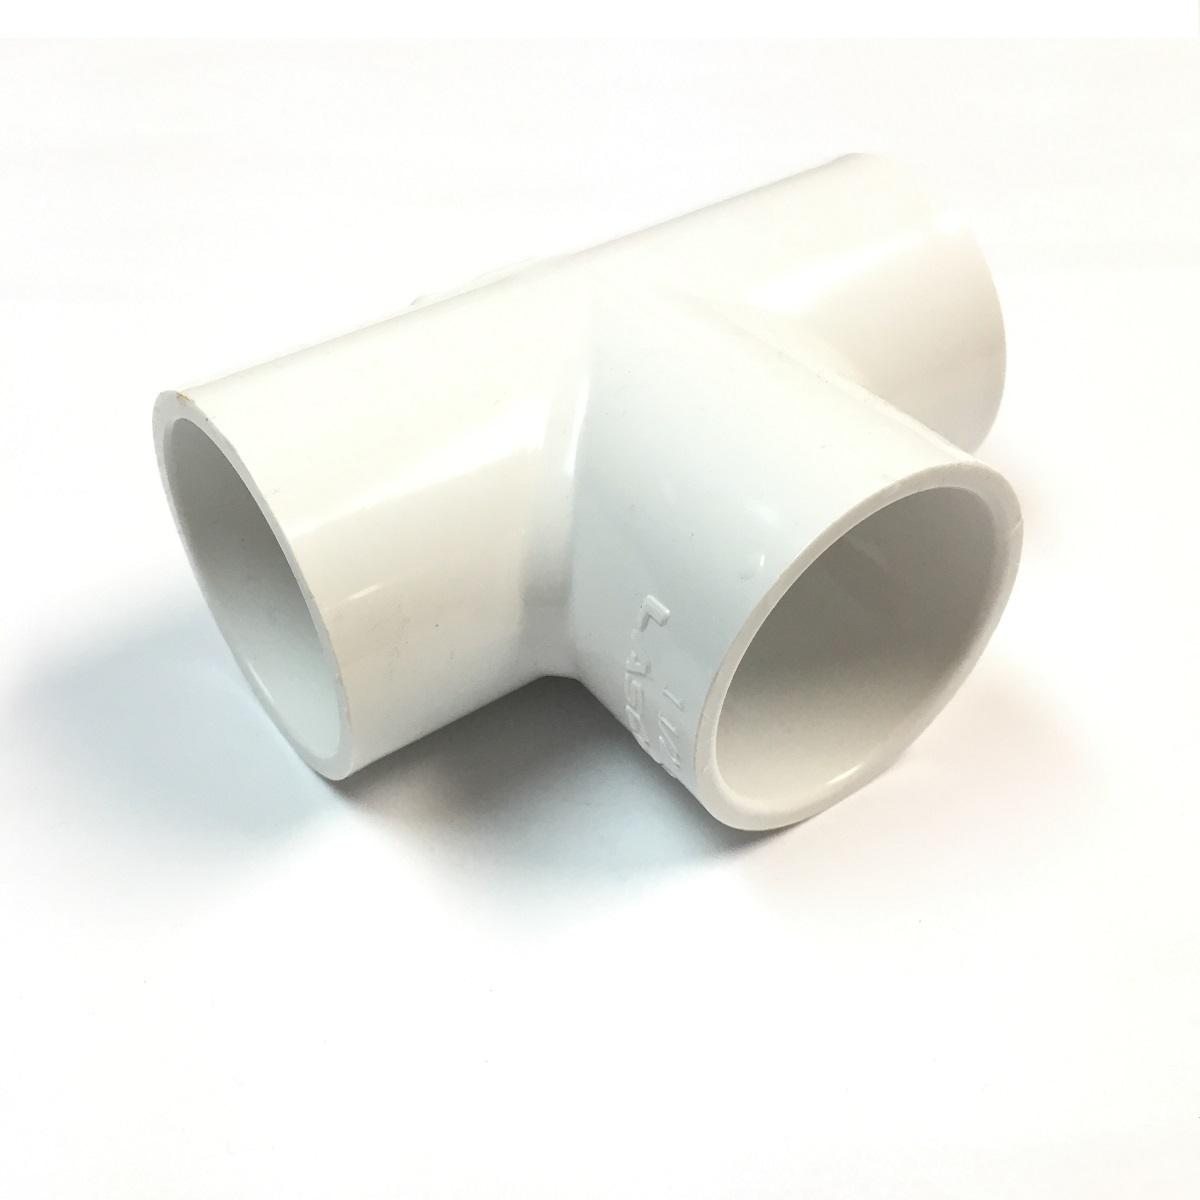 Tee 1 39 39 1 2 concept piscine design piscines spas for Piscine design concept